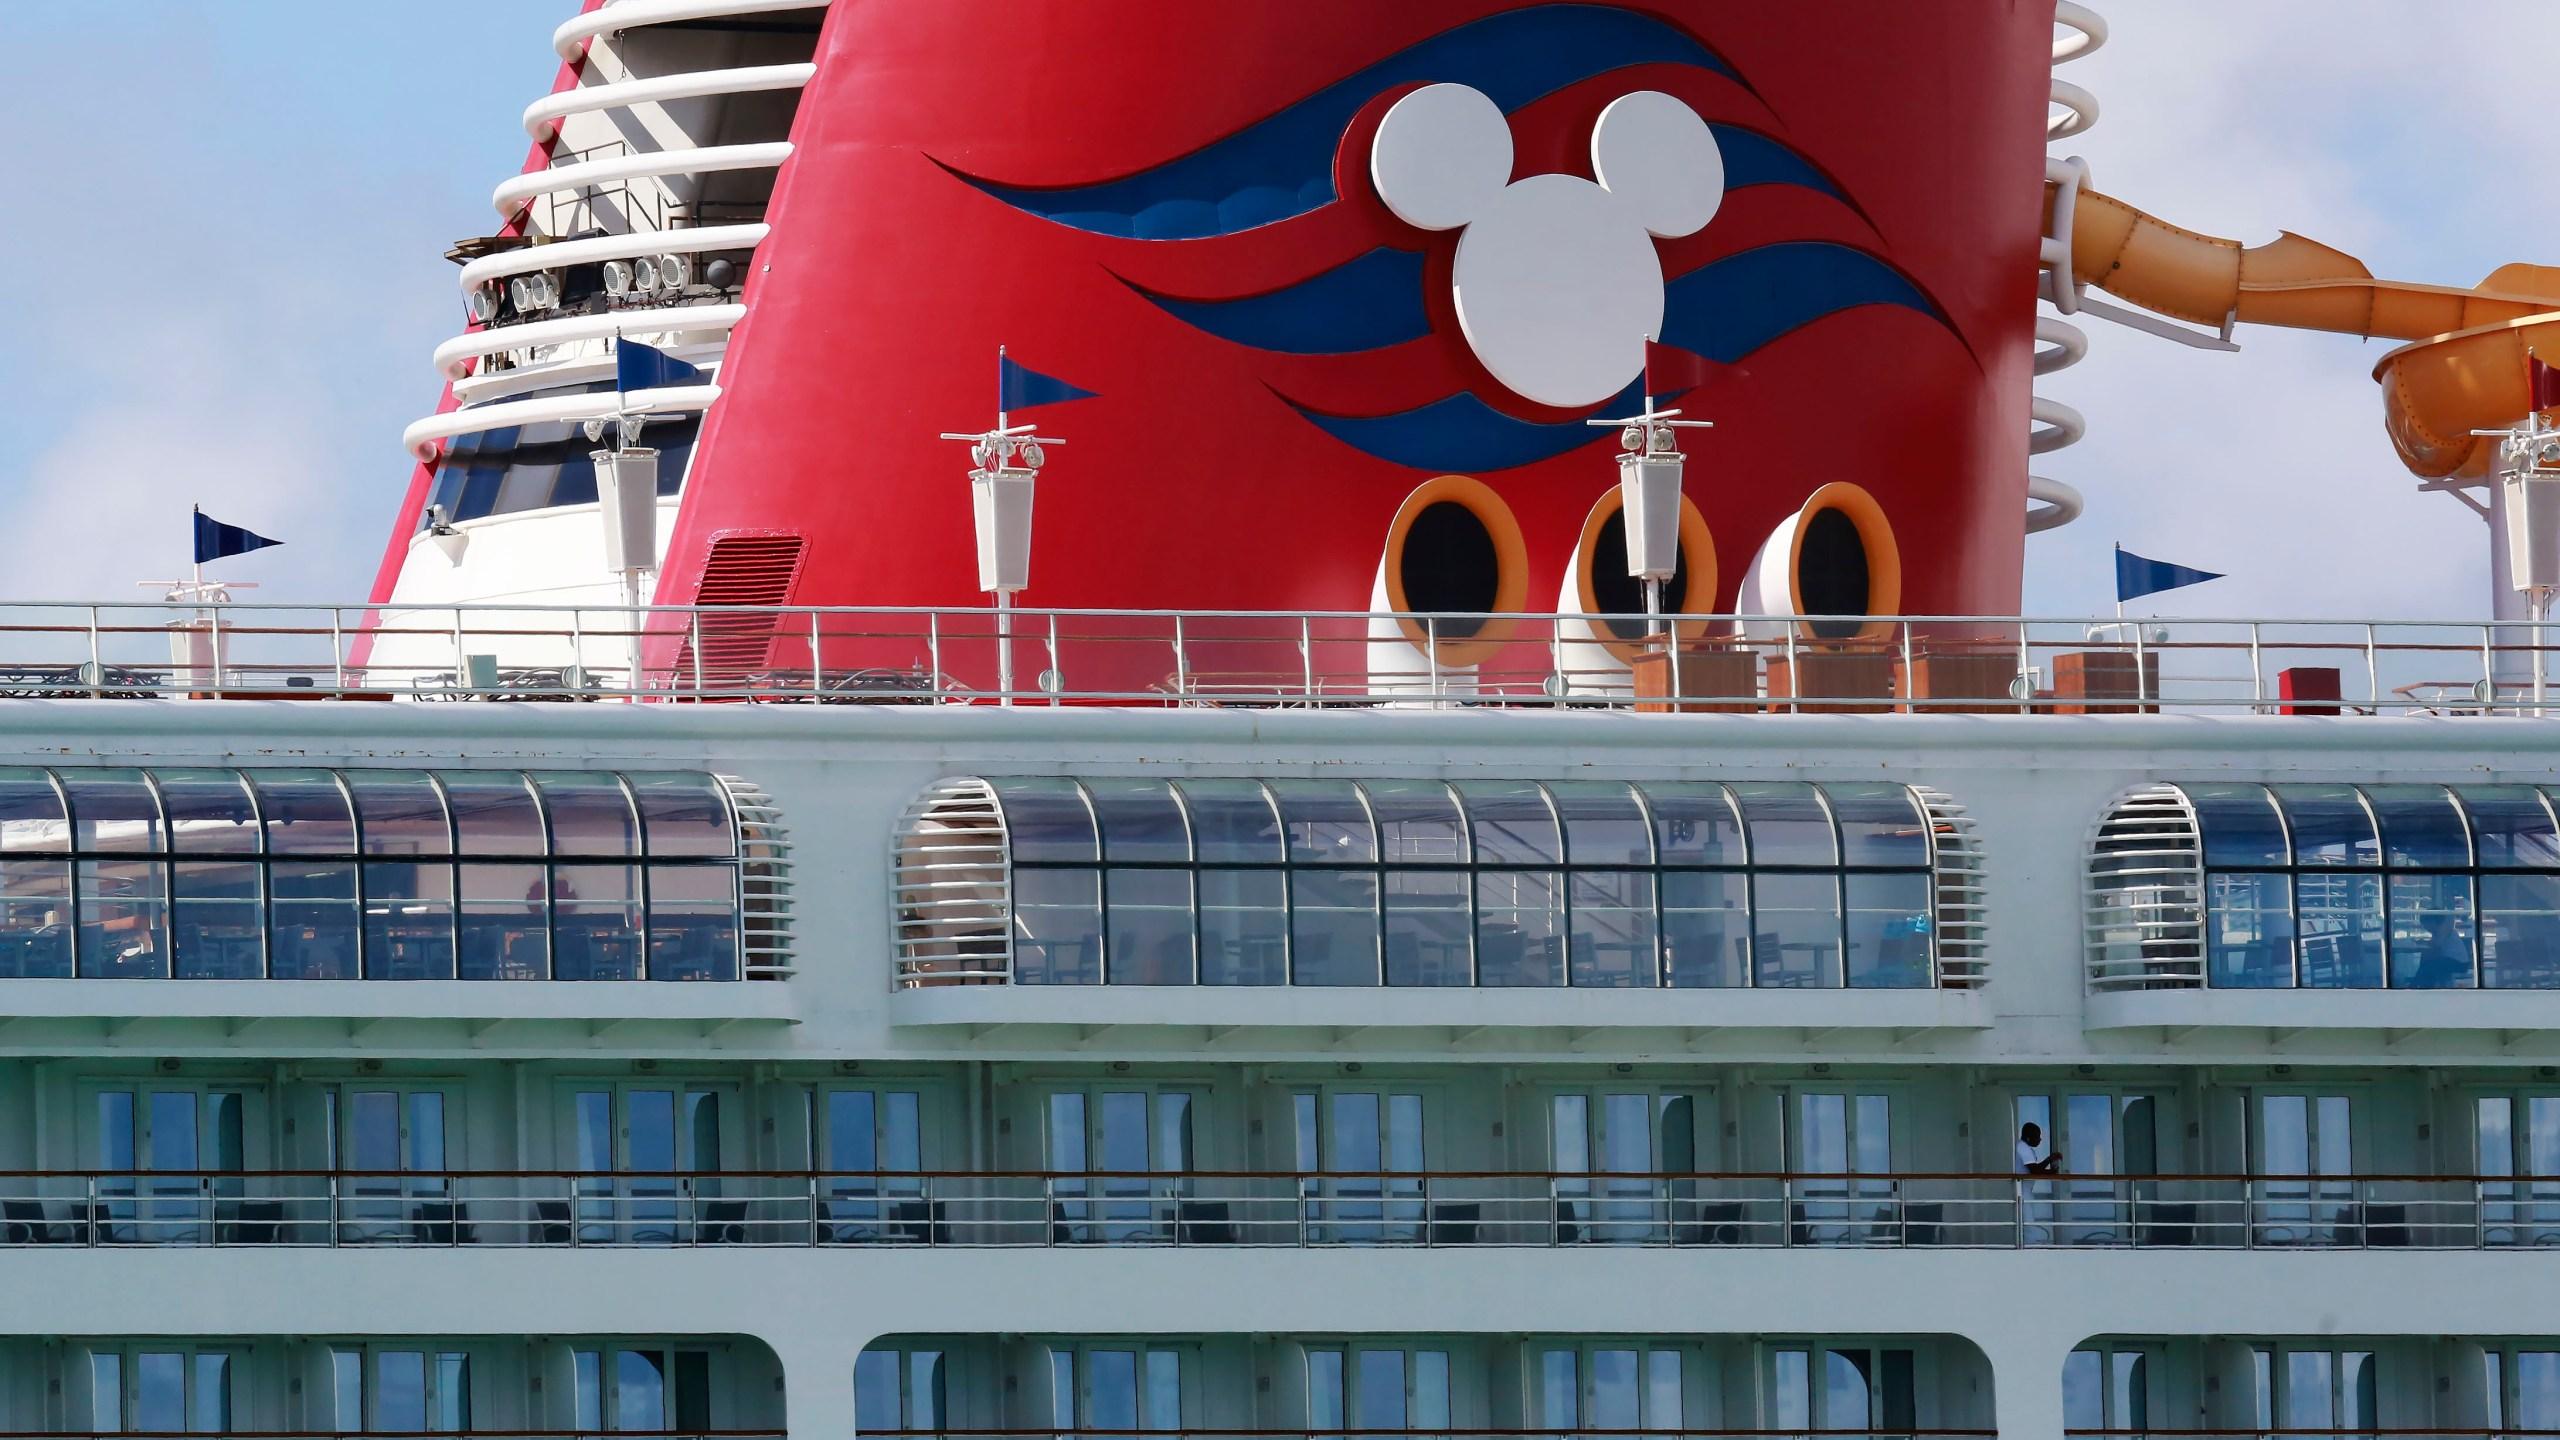 Disney joins Royal Caribbean, Norwegian in suspending cruises until at least March